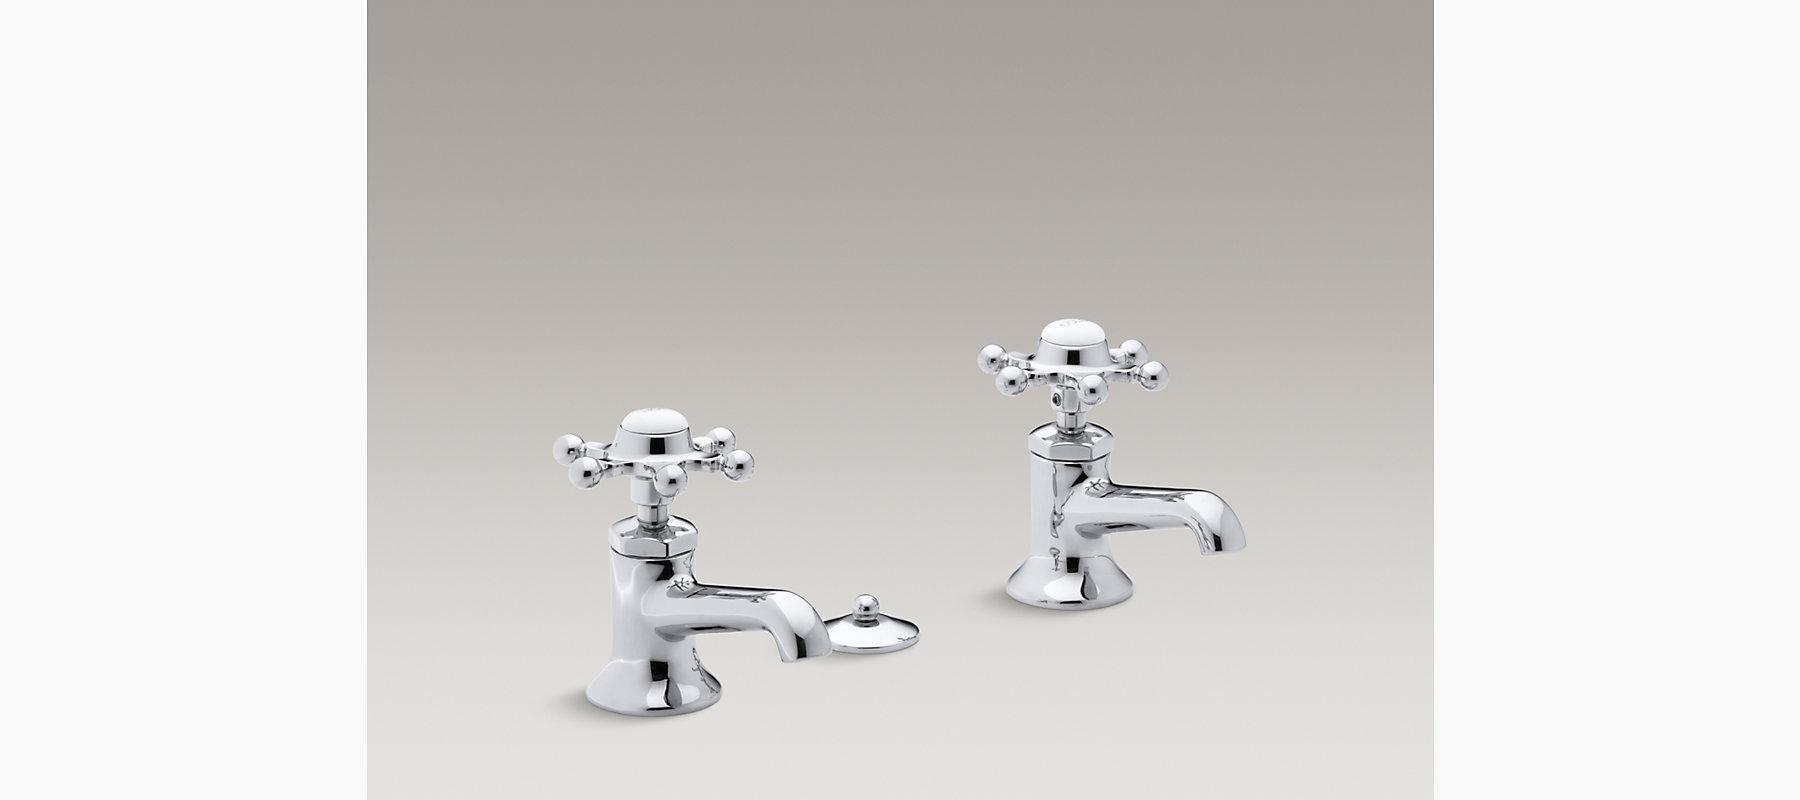 Antique Pillar Tap Sink Faucets, Six-Prong Handles | K-153-3 | KOHLER